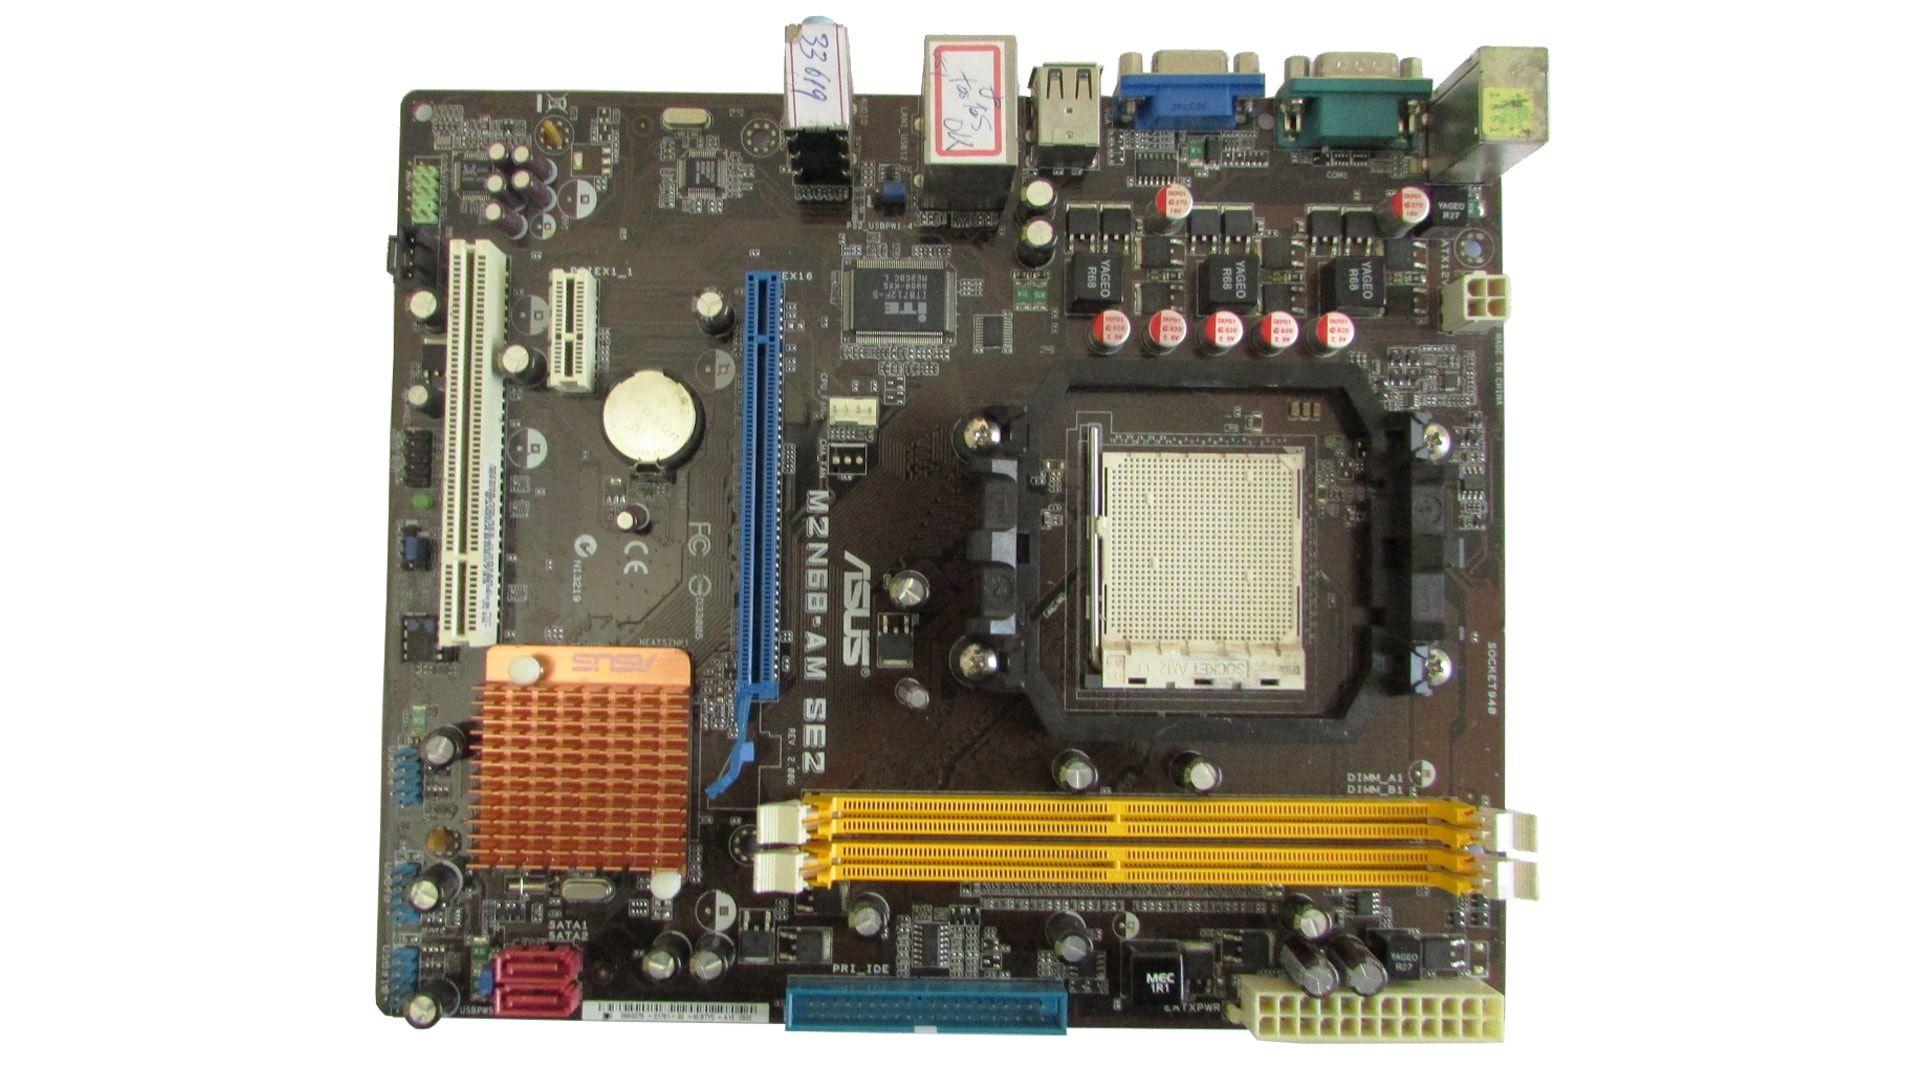 Placa Mãe Asus  M2N68-AM SE2 AM2 DDR2 Semi Nova C/ Espelho